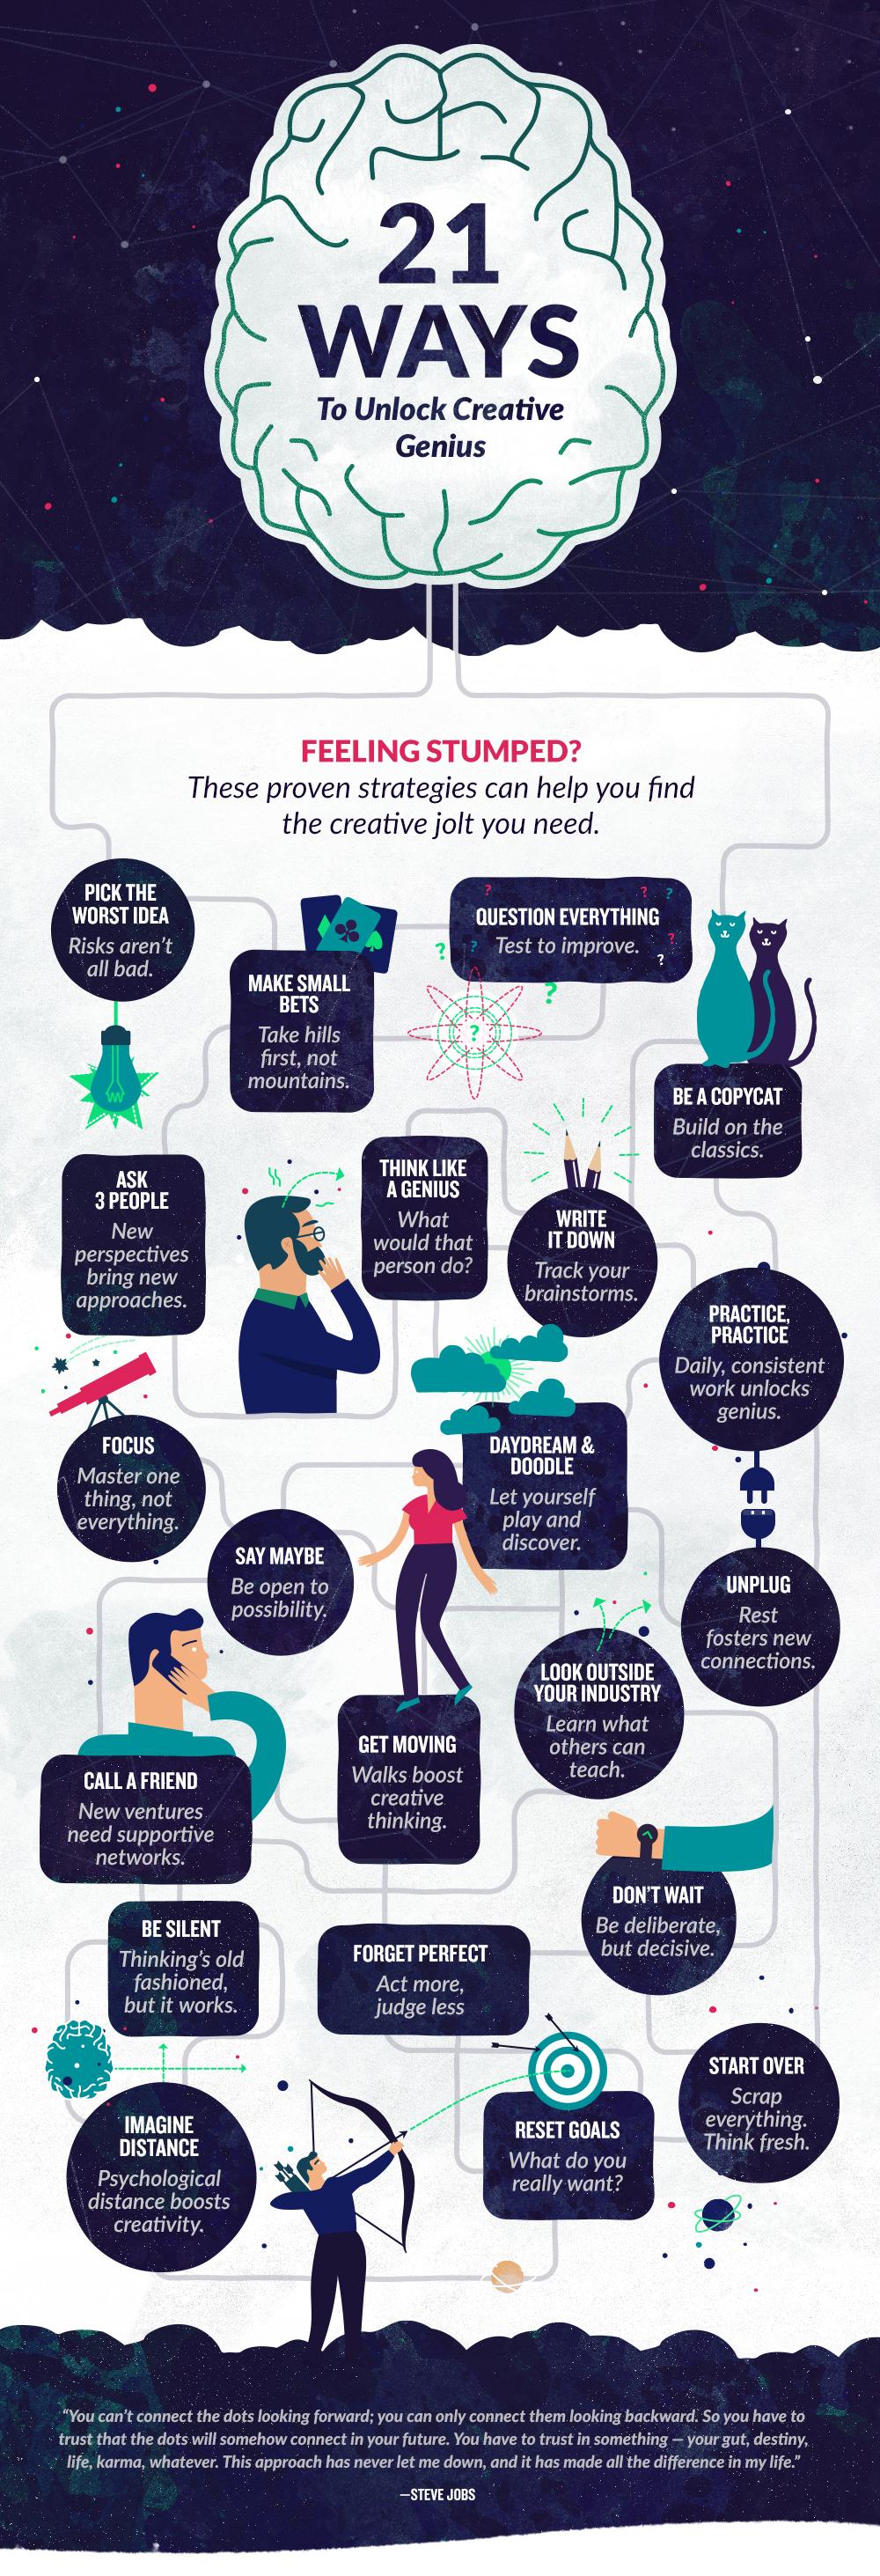 11 Infographic Design Trends 2018: Make Data Look Hot